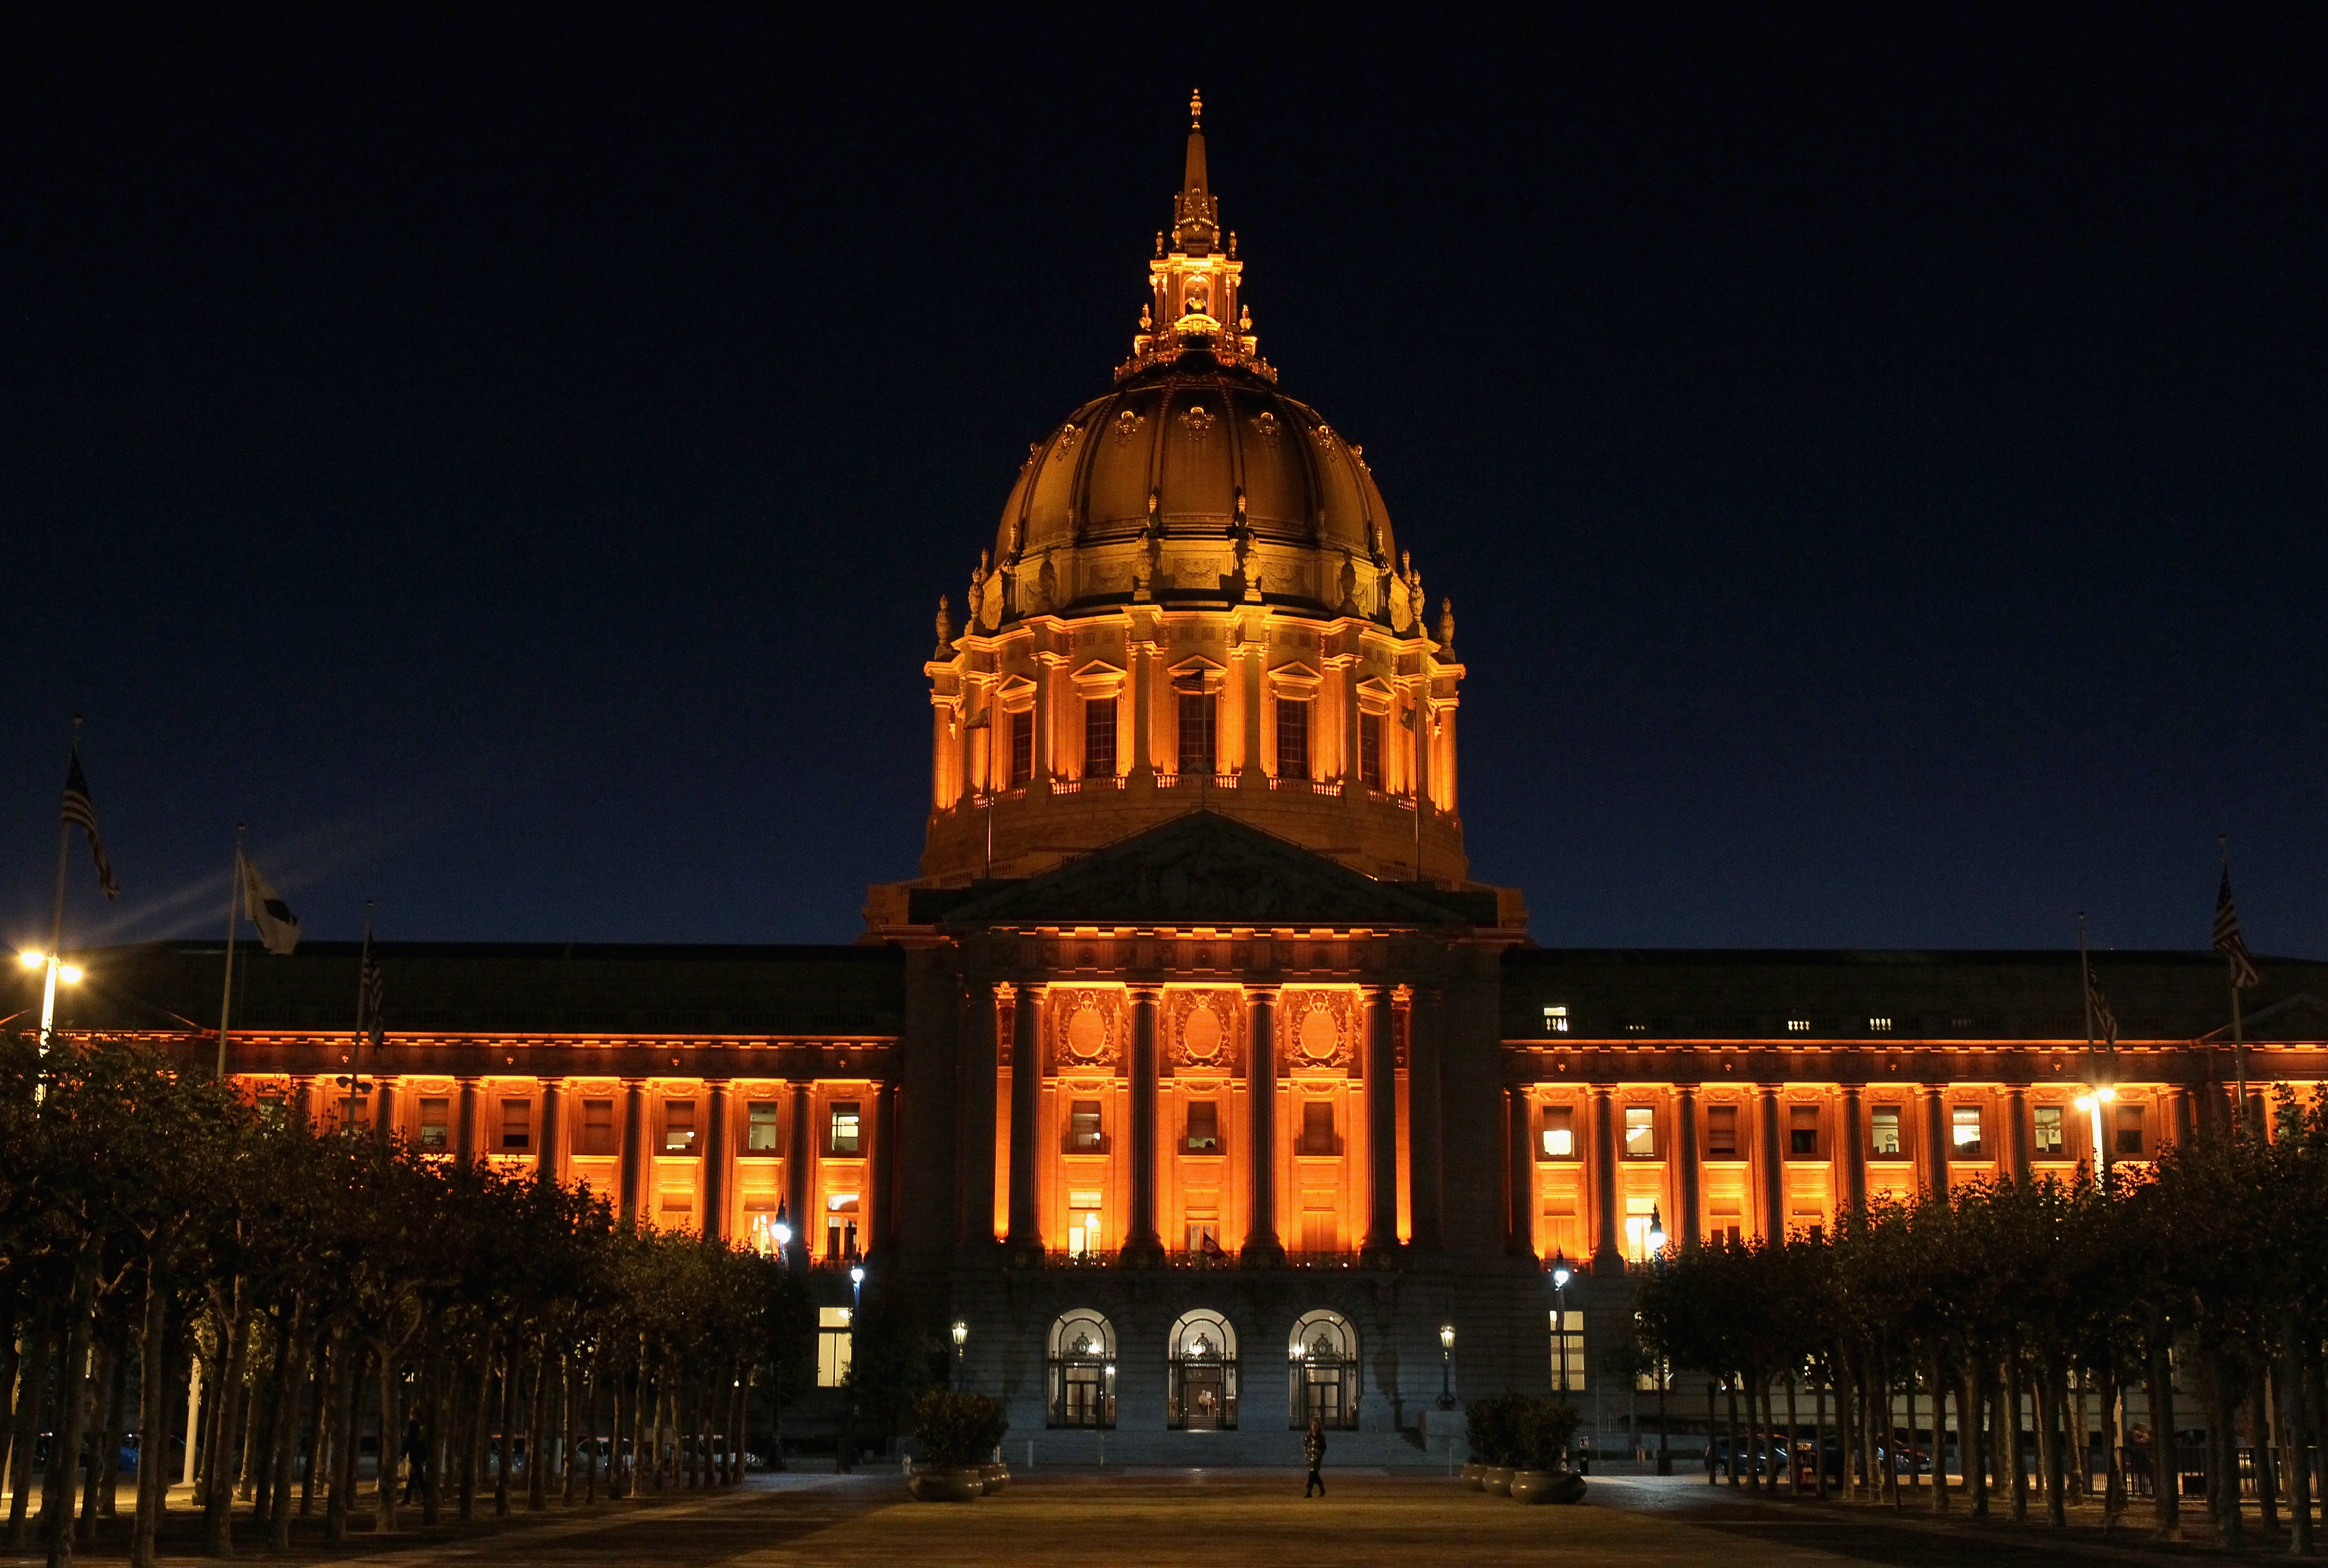 San Francisco Celebrates SF Giants Winning NLCS